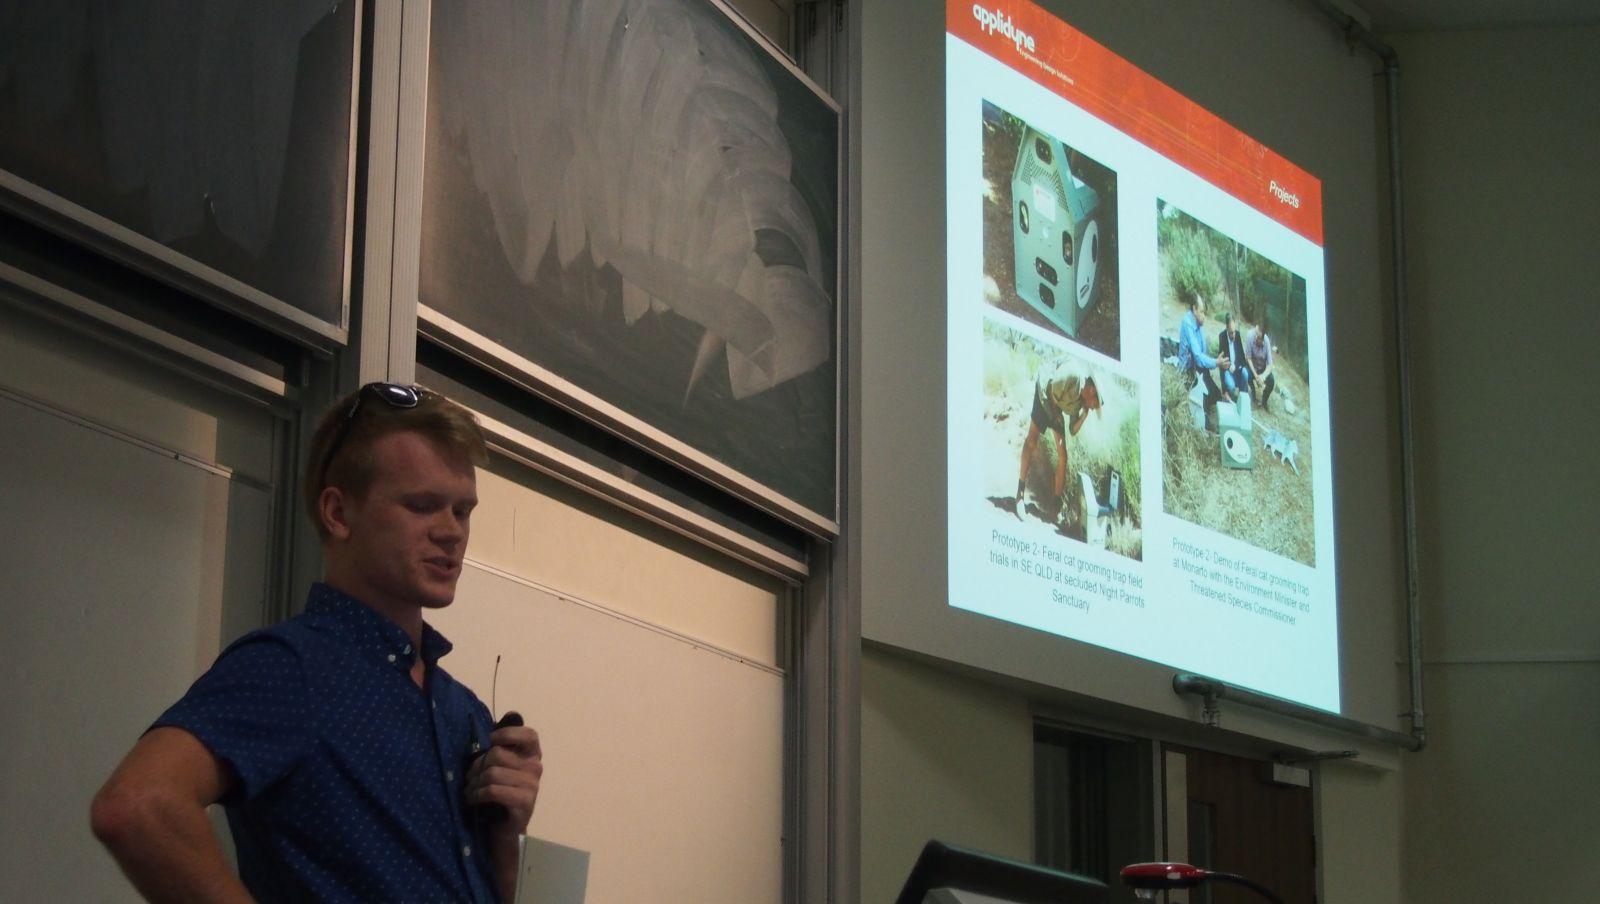 Applidyne Engineering Scholarship winner visits Adelaide Uni